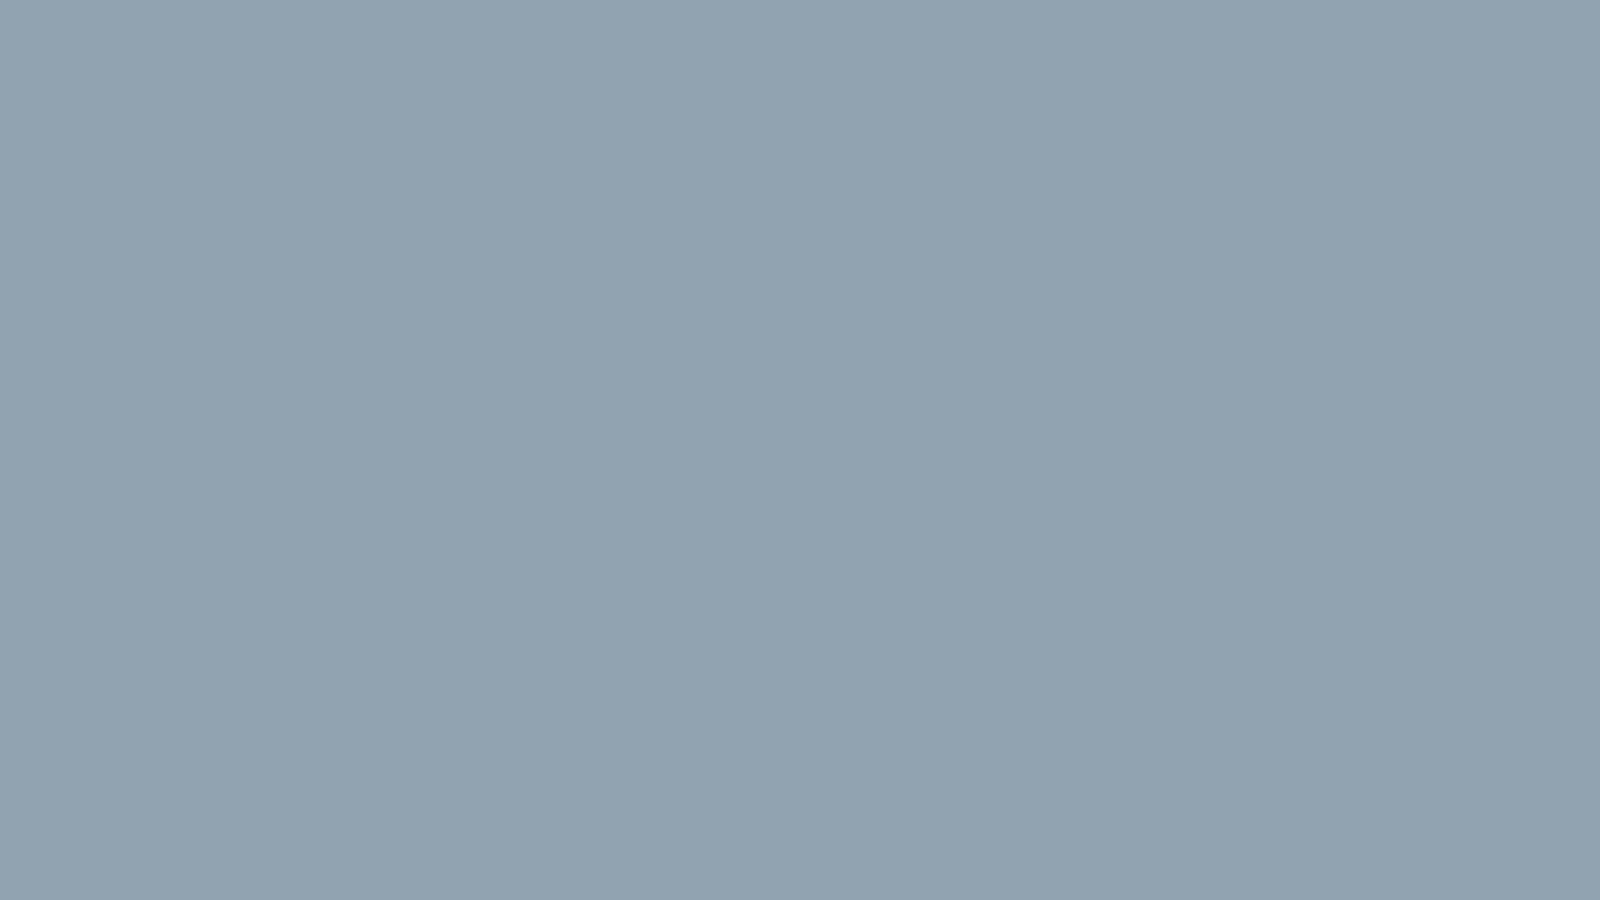 1600x900 Cadet Grey Solid Color Background